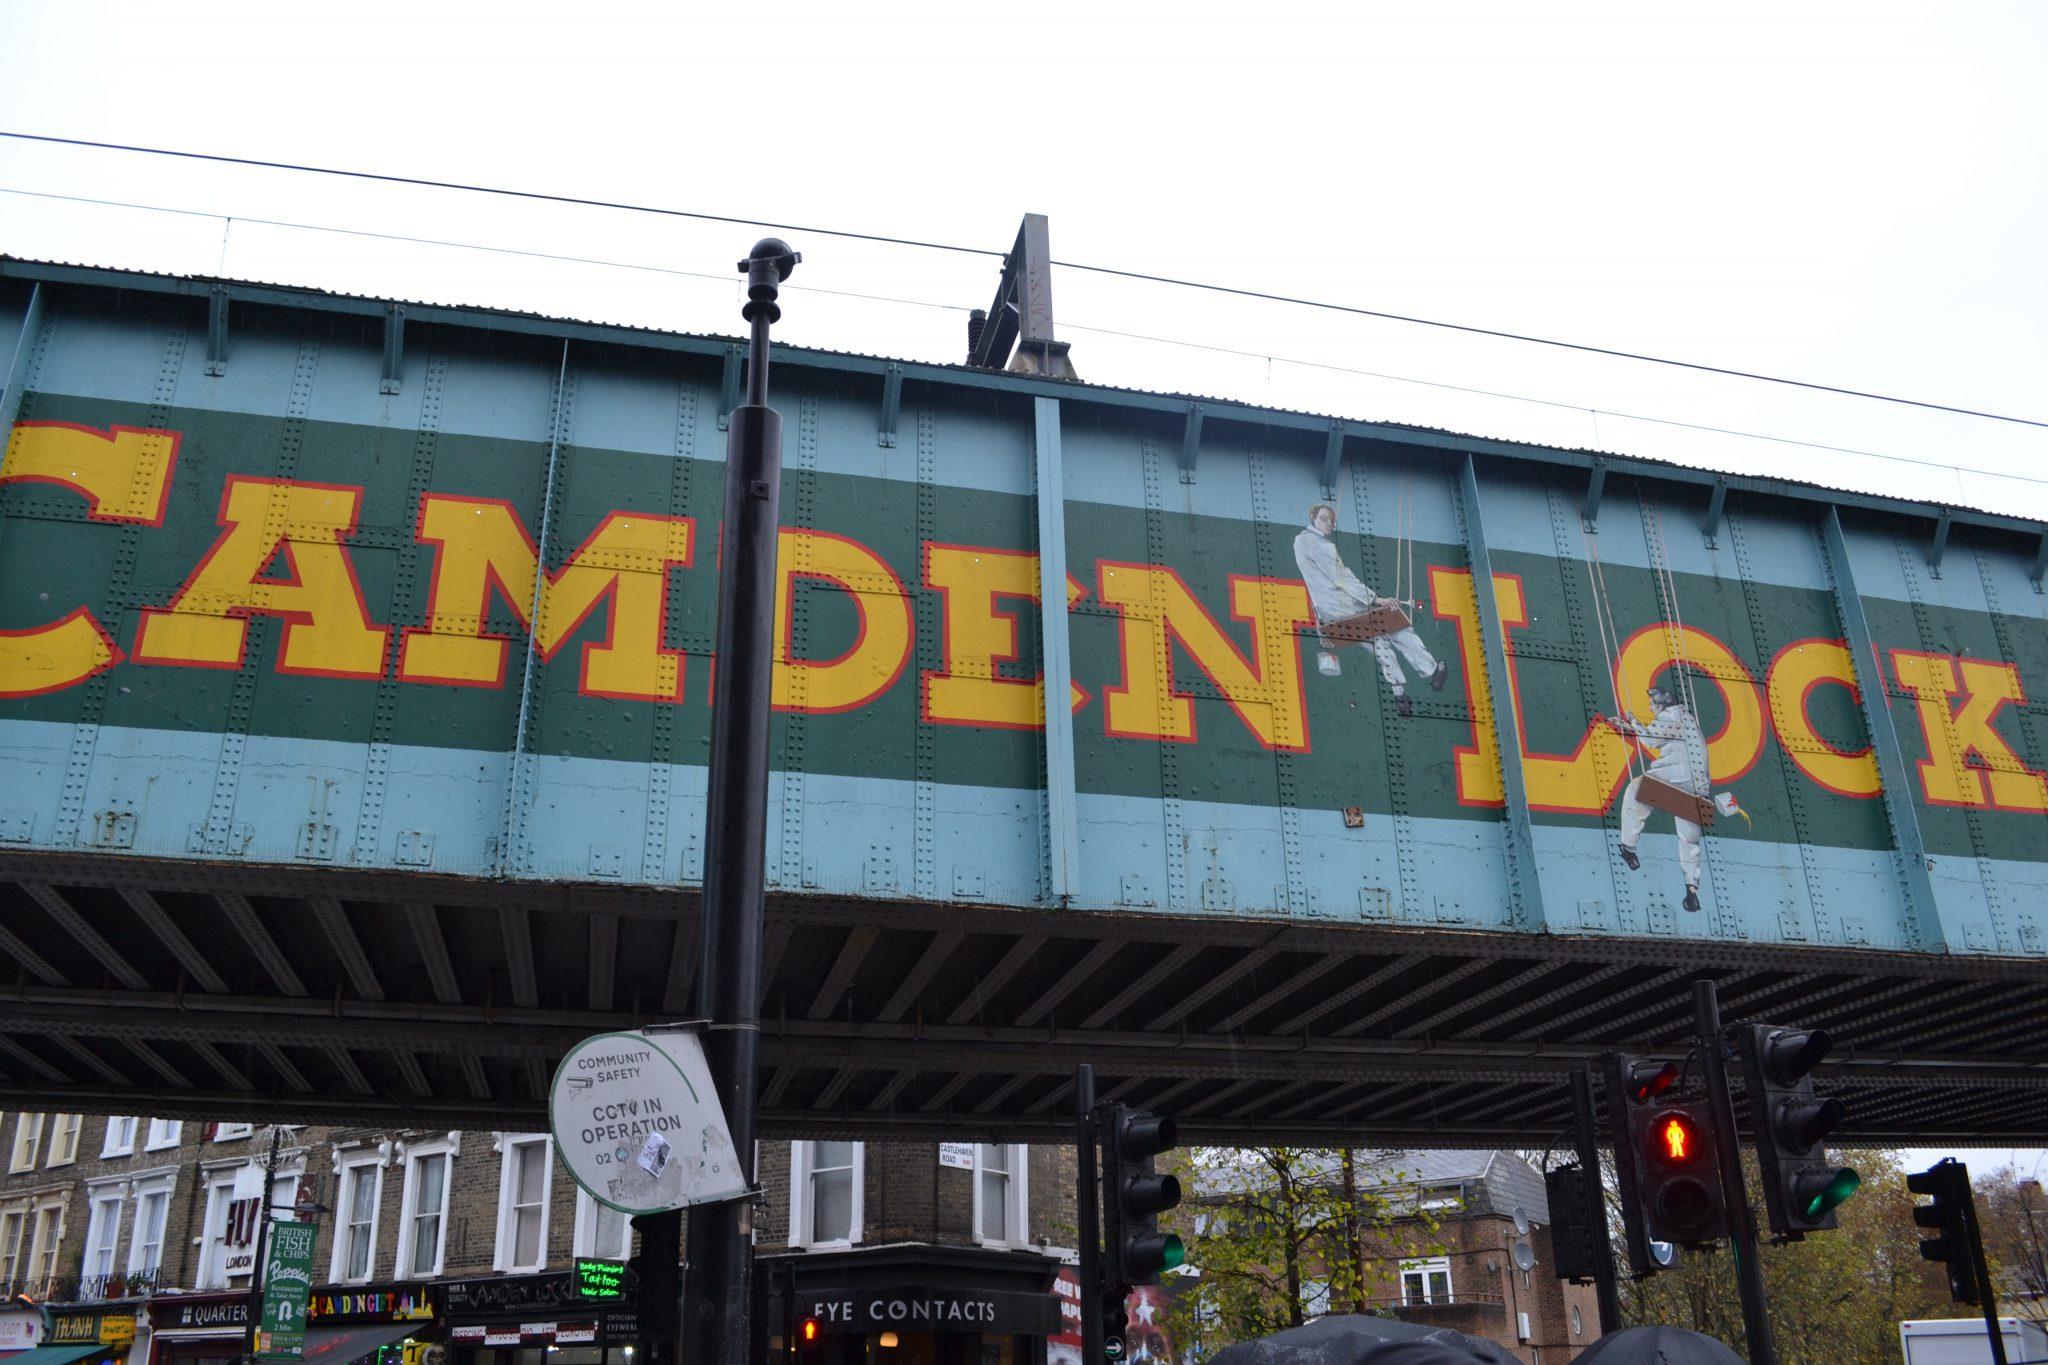 Travel Diary: London Part 2 | Camden - DSC 0170